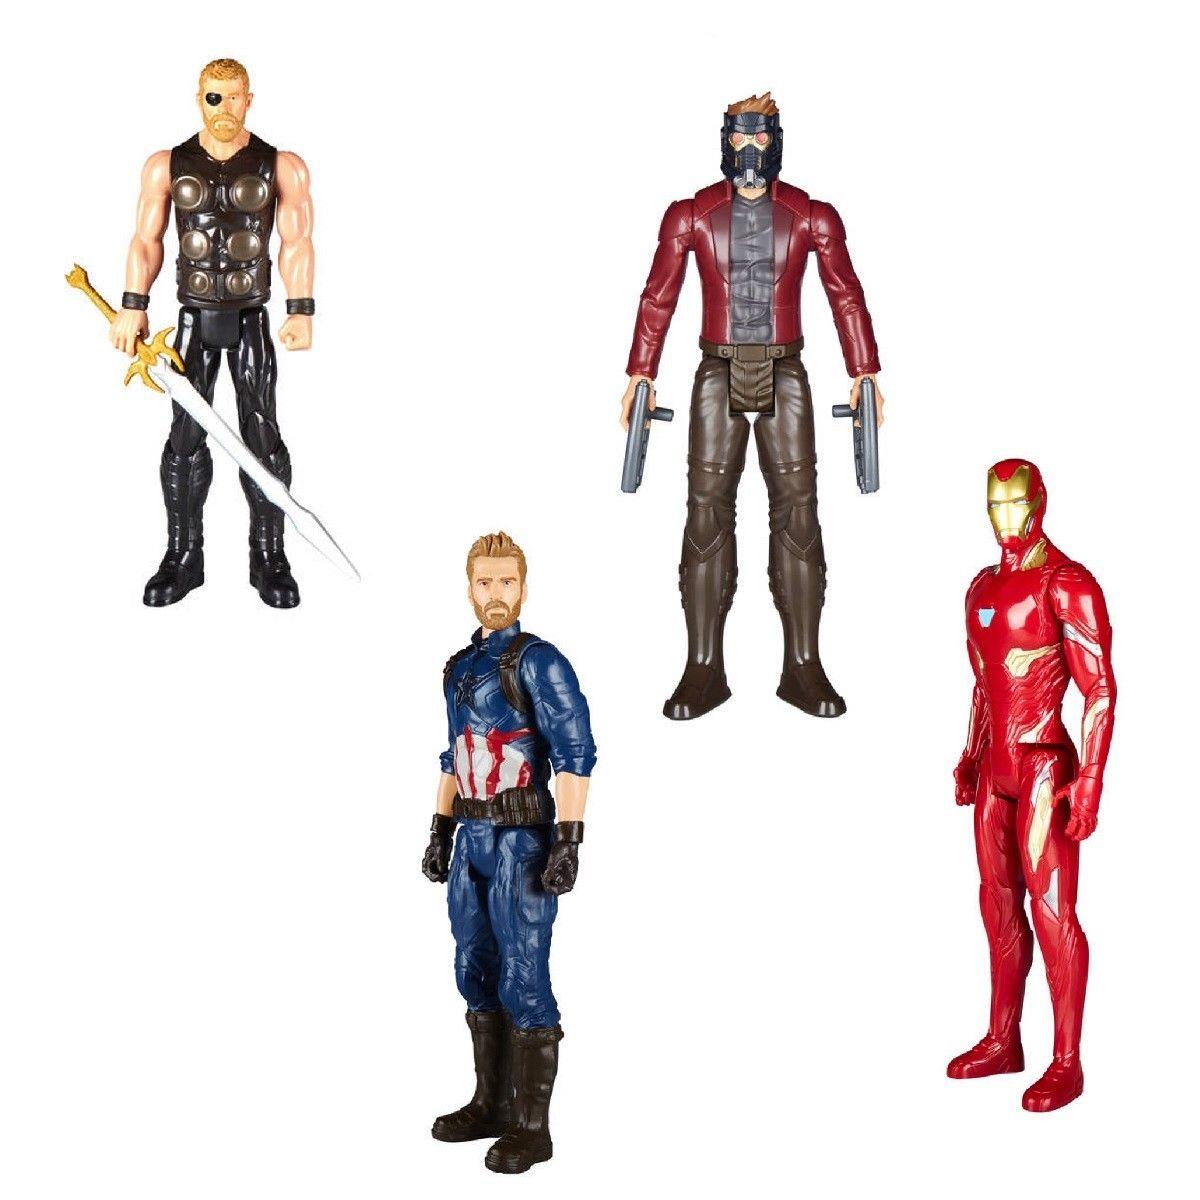 Купить Фигурки Титаны из серии Avengers Movie. Мстители, Hasbro